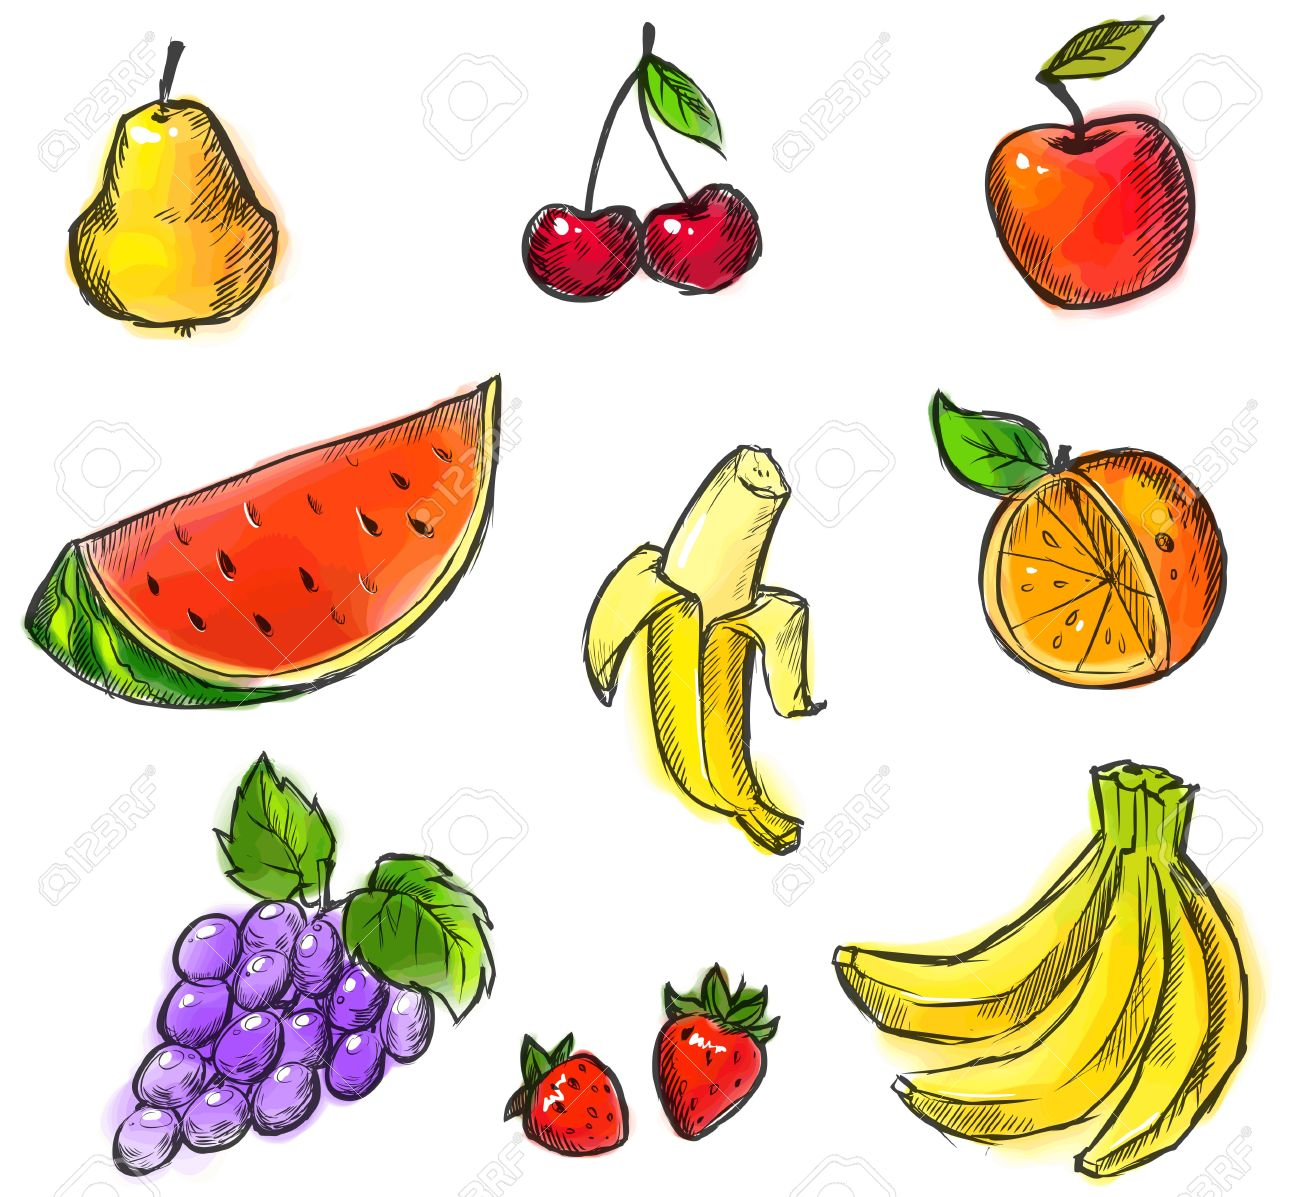 Fruits Drawing Images at GetDrawings.com